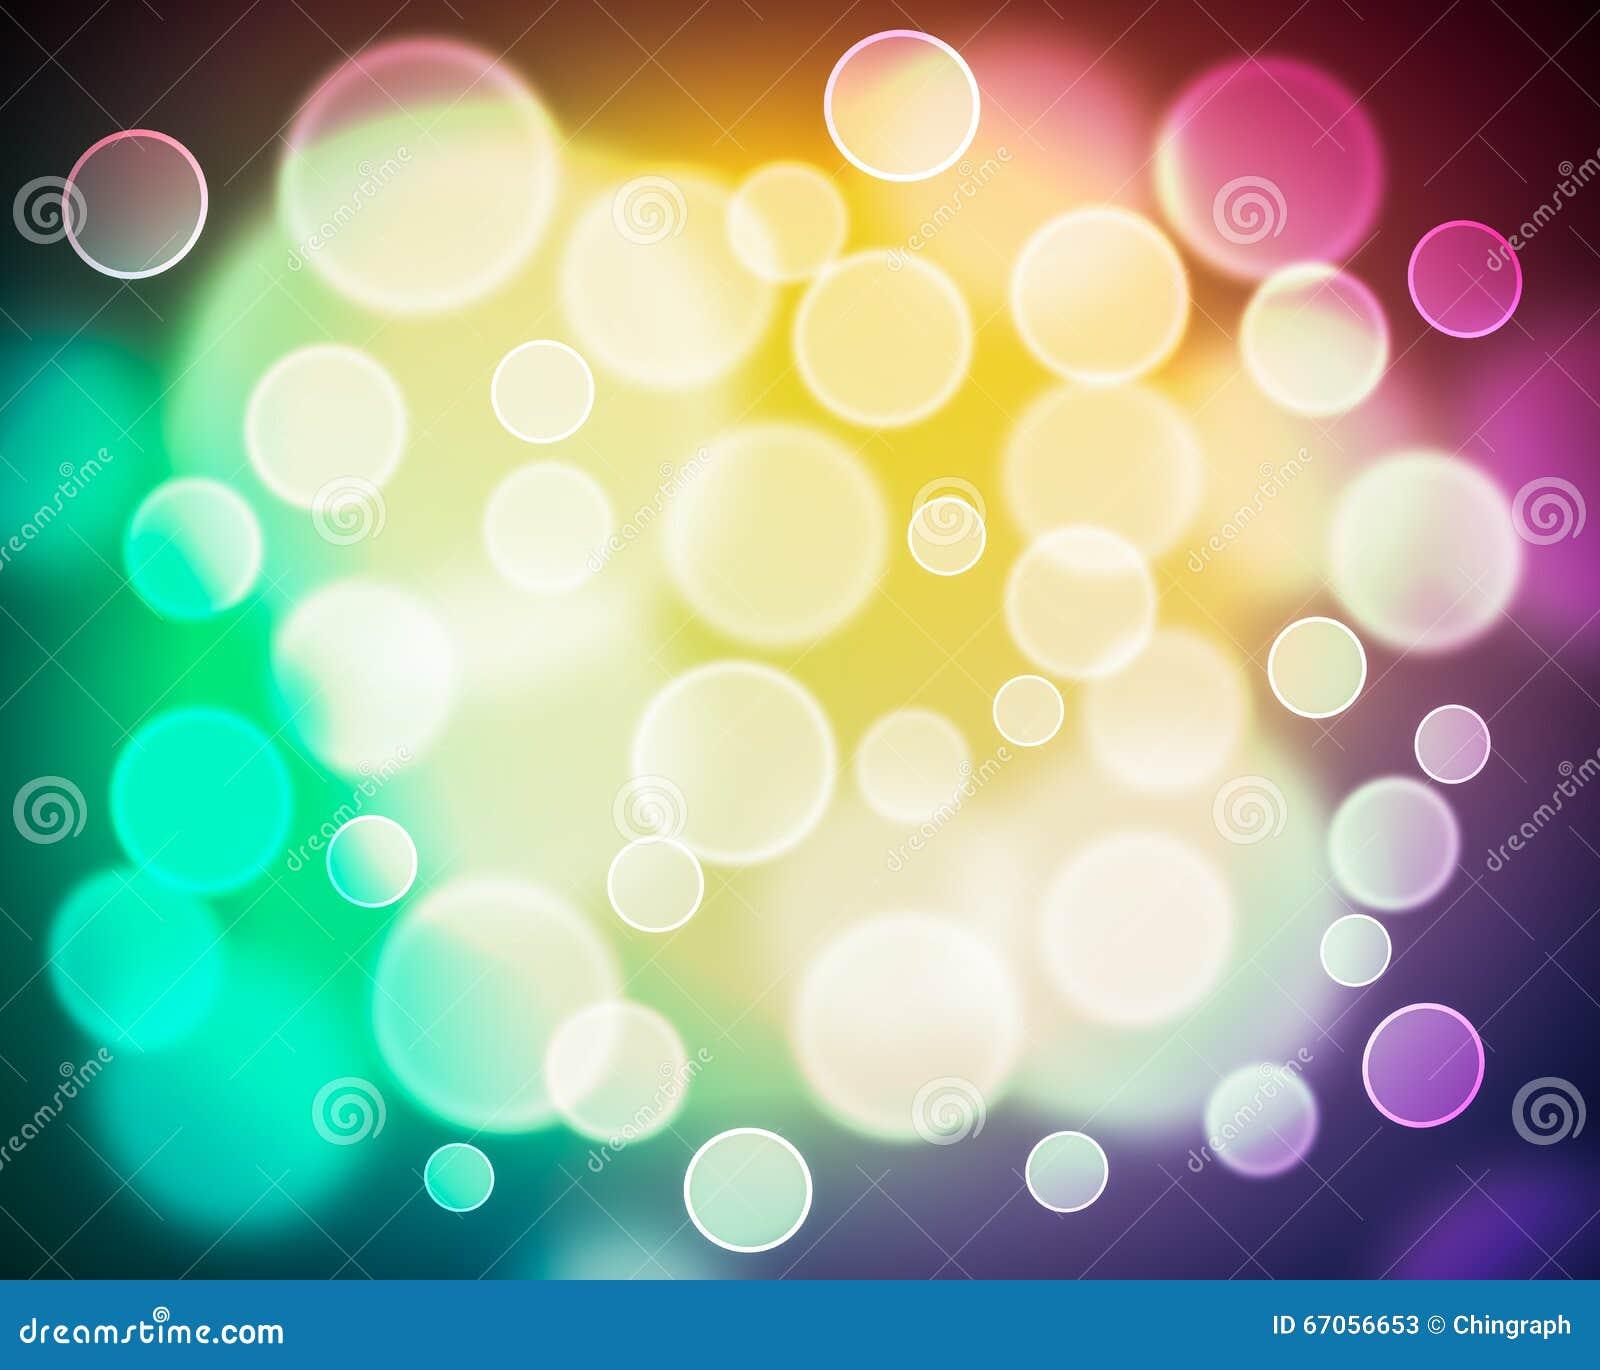 Abstract Blur Boken Background